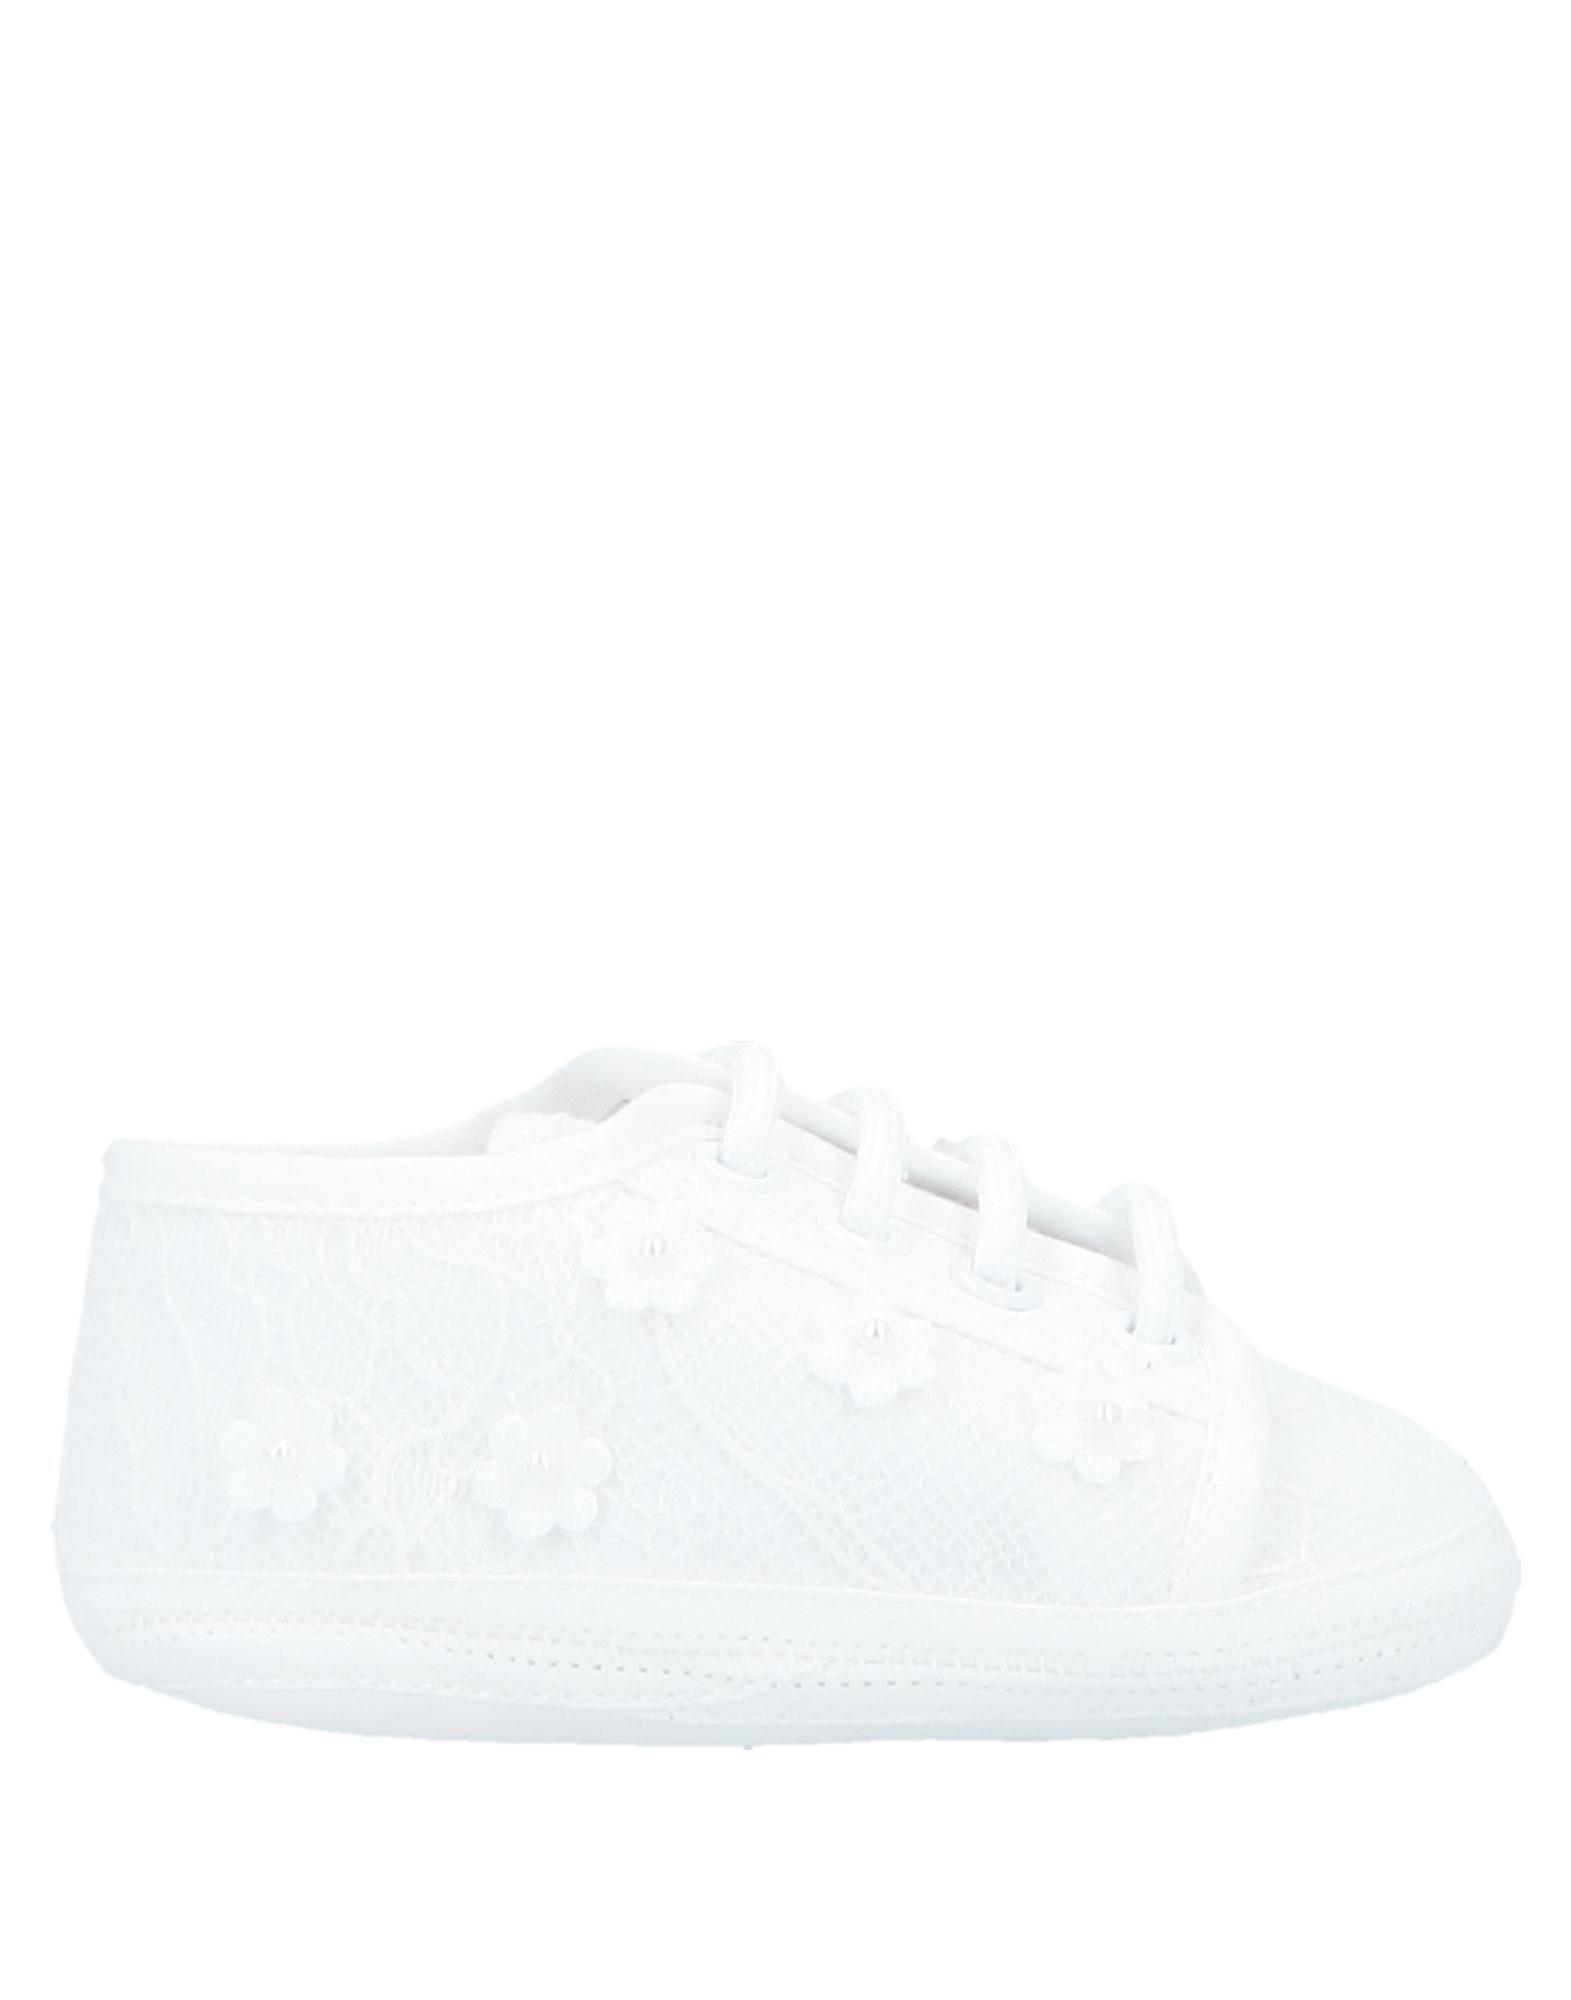 65828f9931 Παπούτσια Για Νεογέννητα Kορίτσι Aletta 0-24 μηνών - Παιδικά ρούχα στο YOOX